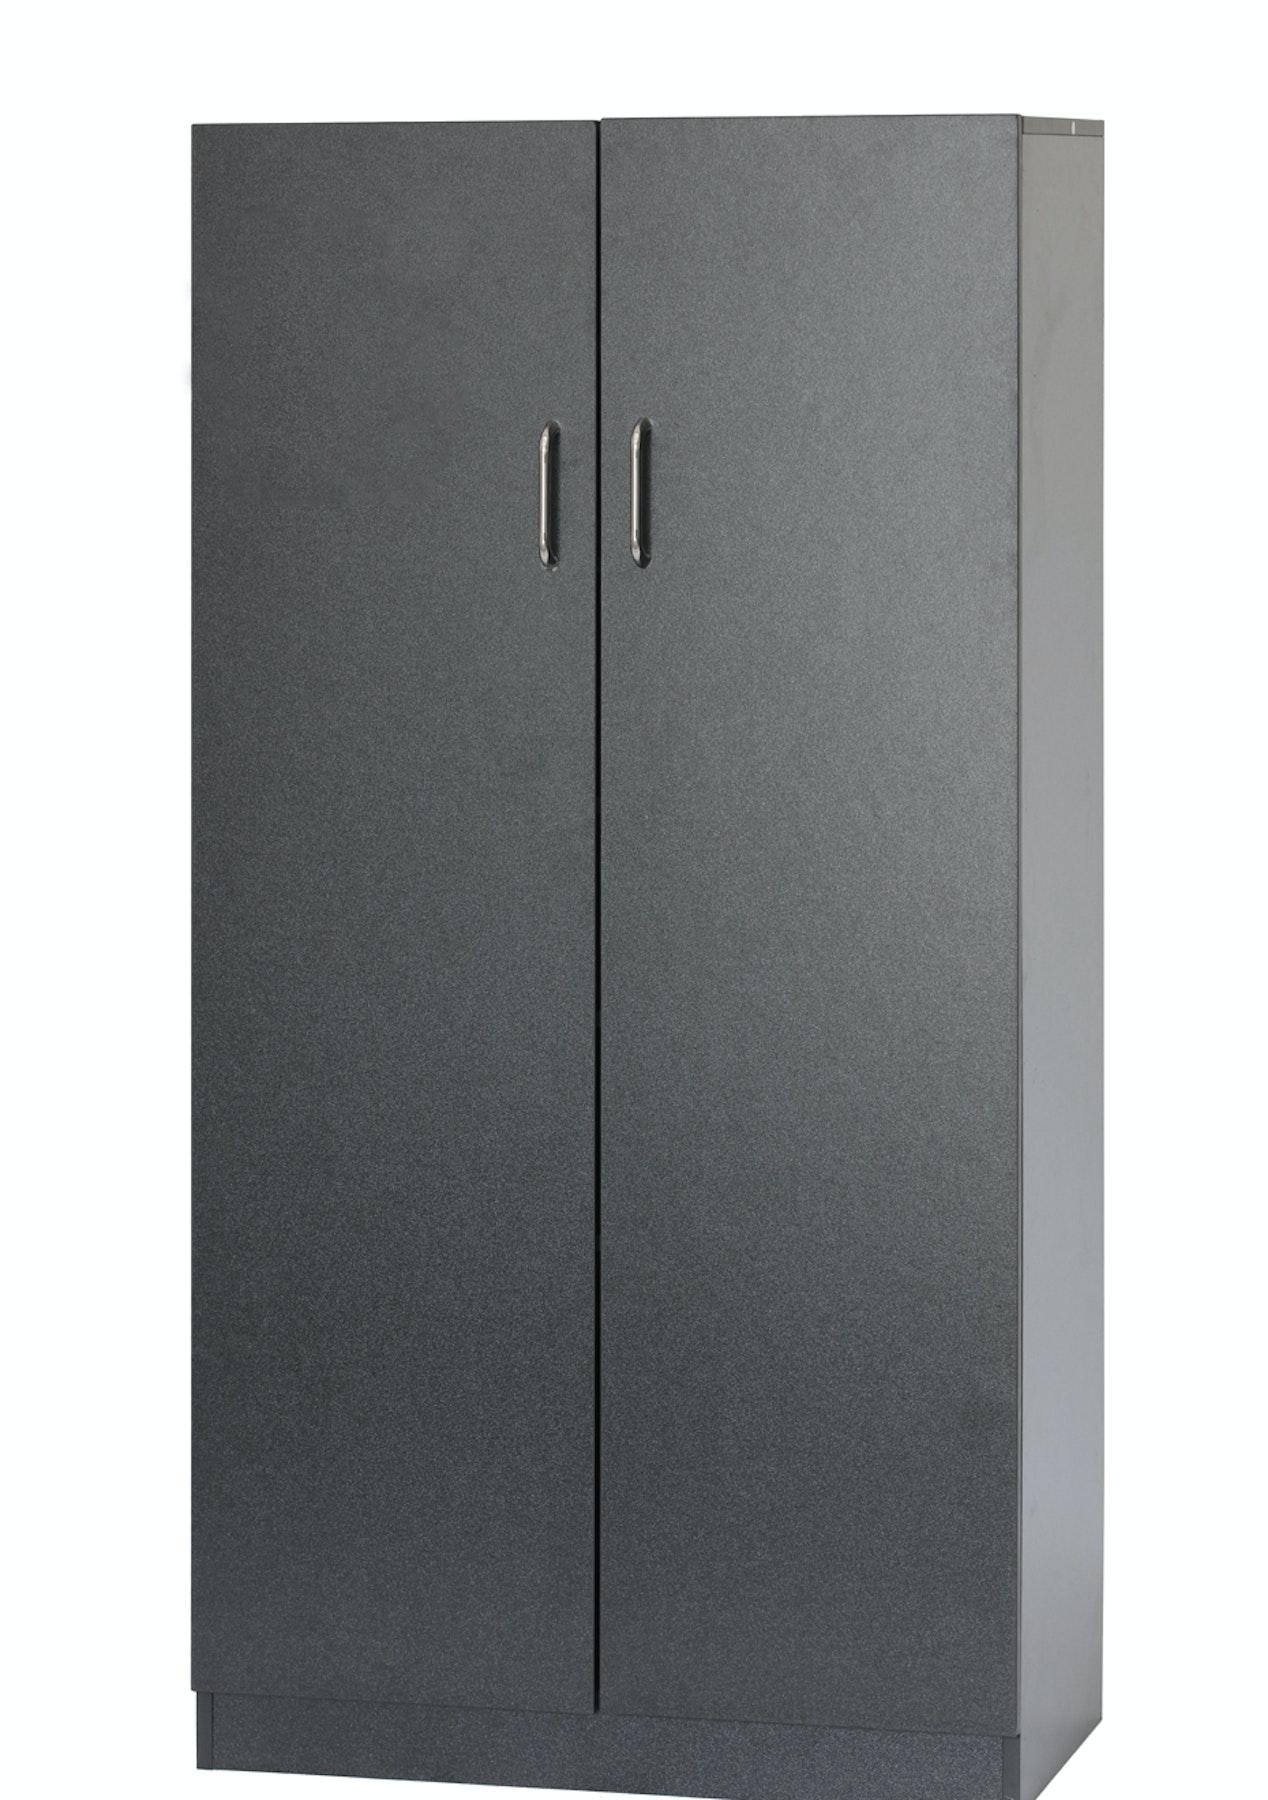 12m 2 Door Storage Cabinet Black The Big Furniture Clearance